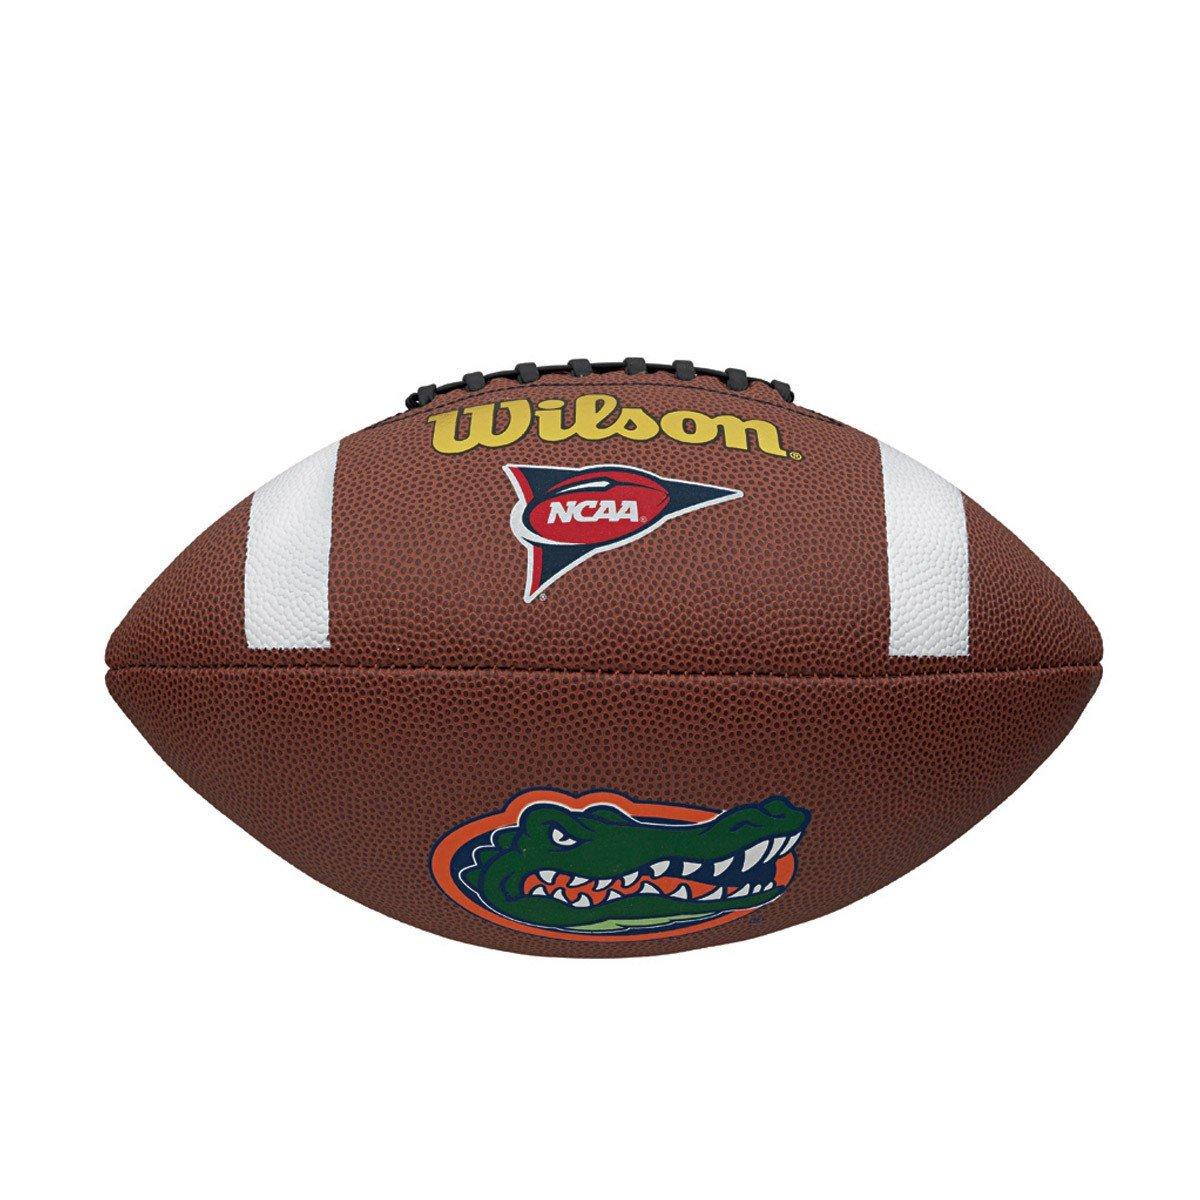 Wilson NCAA Florida Gators Team Composite American Football Wilson Sporting Goods - Team WTF1738 FLA